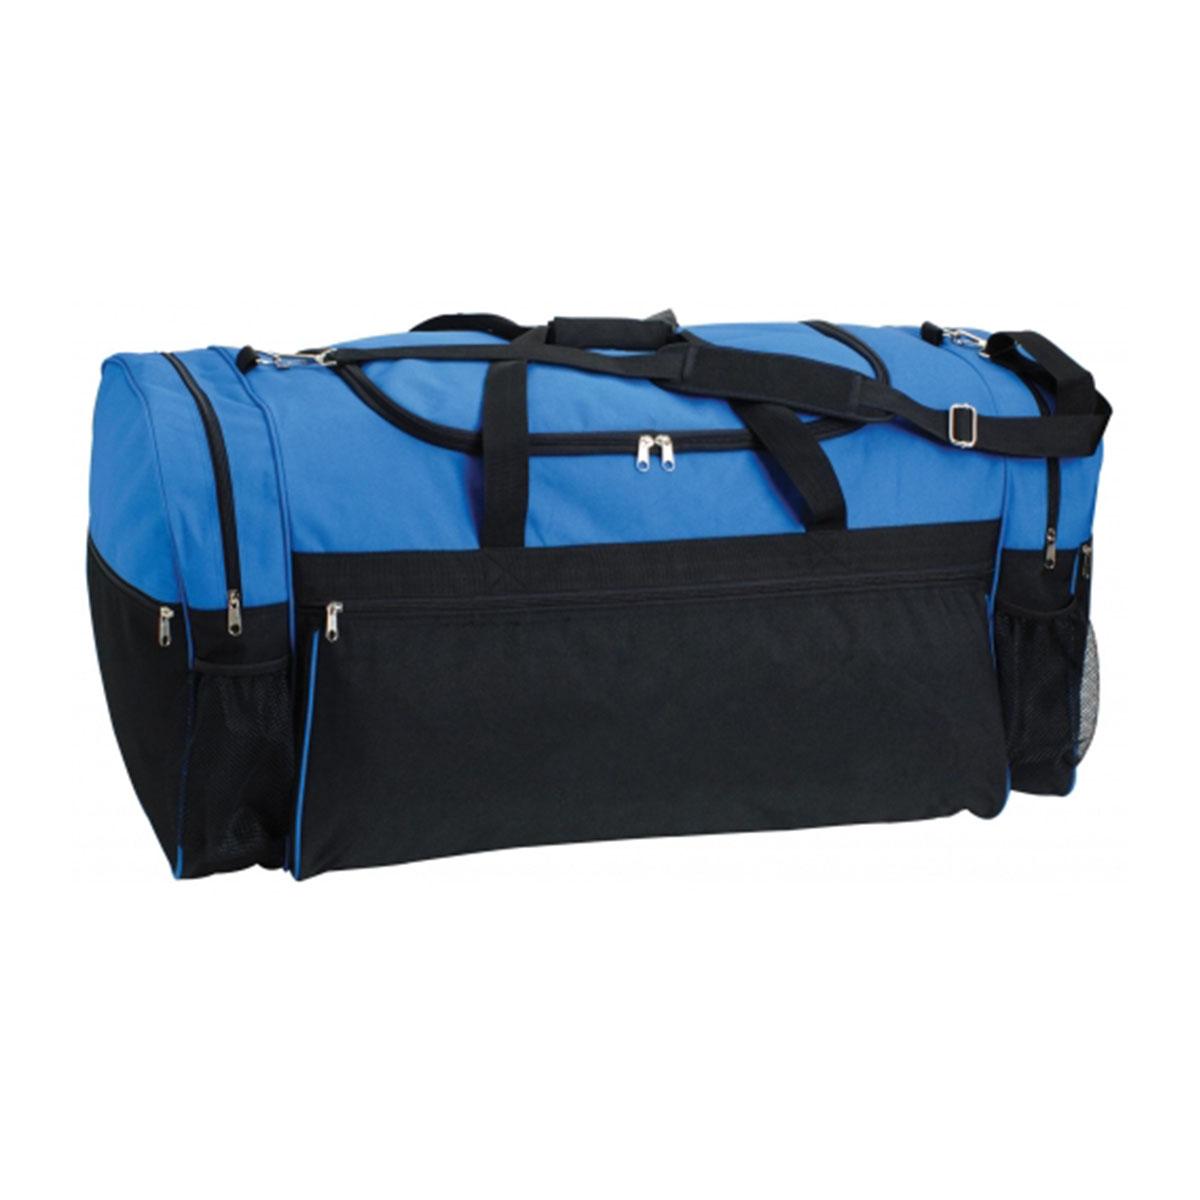 Large Sports Bag-Royal / Black